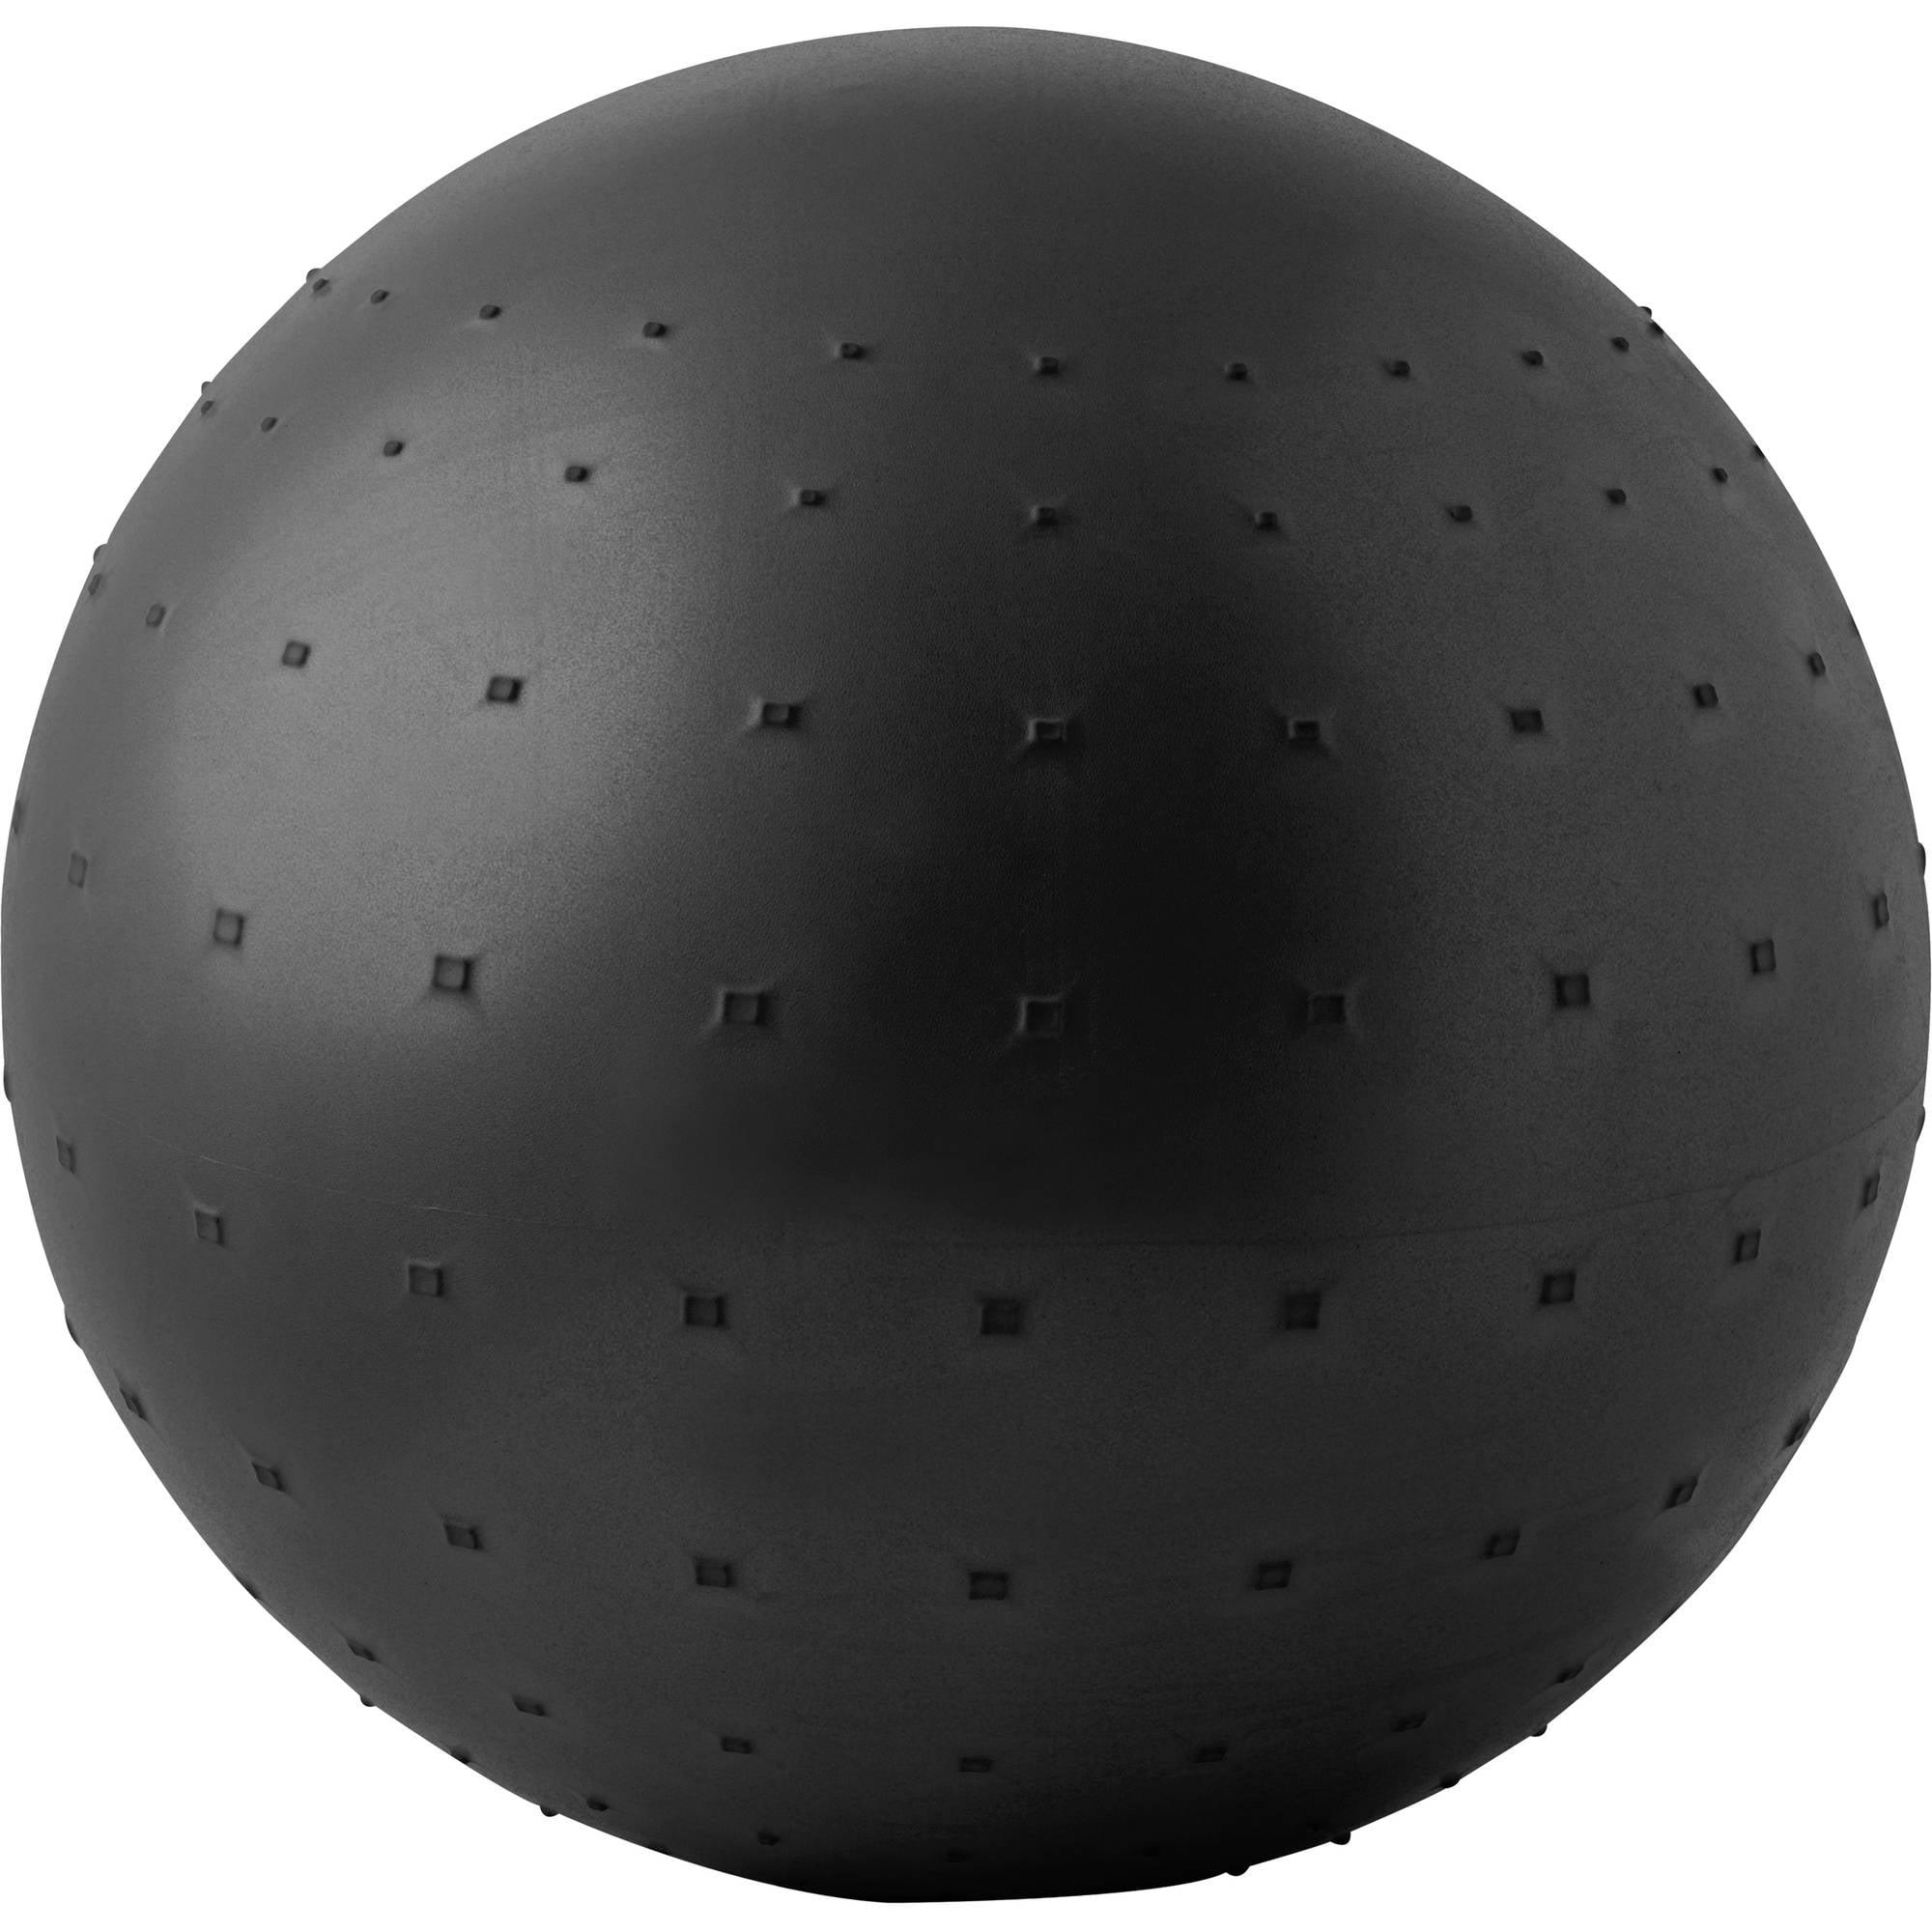 Gold's Gym 75 cm Anti-Burst Performance Ball